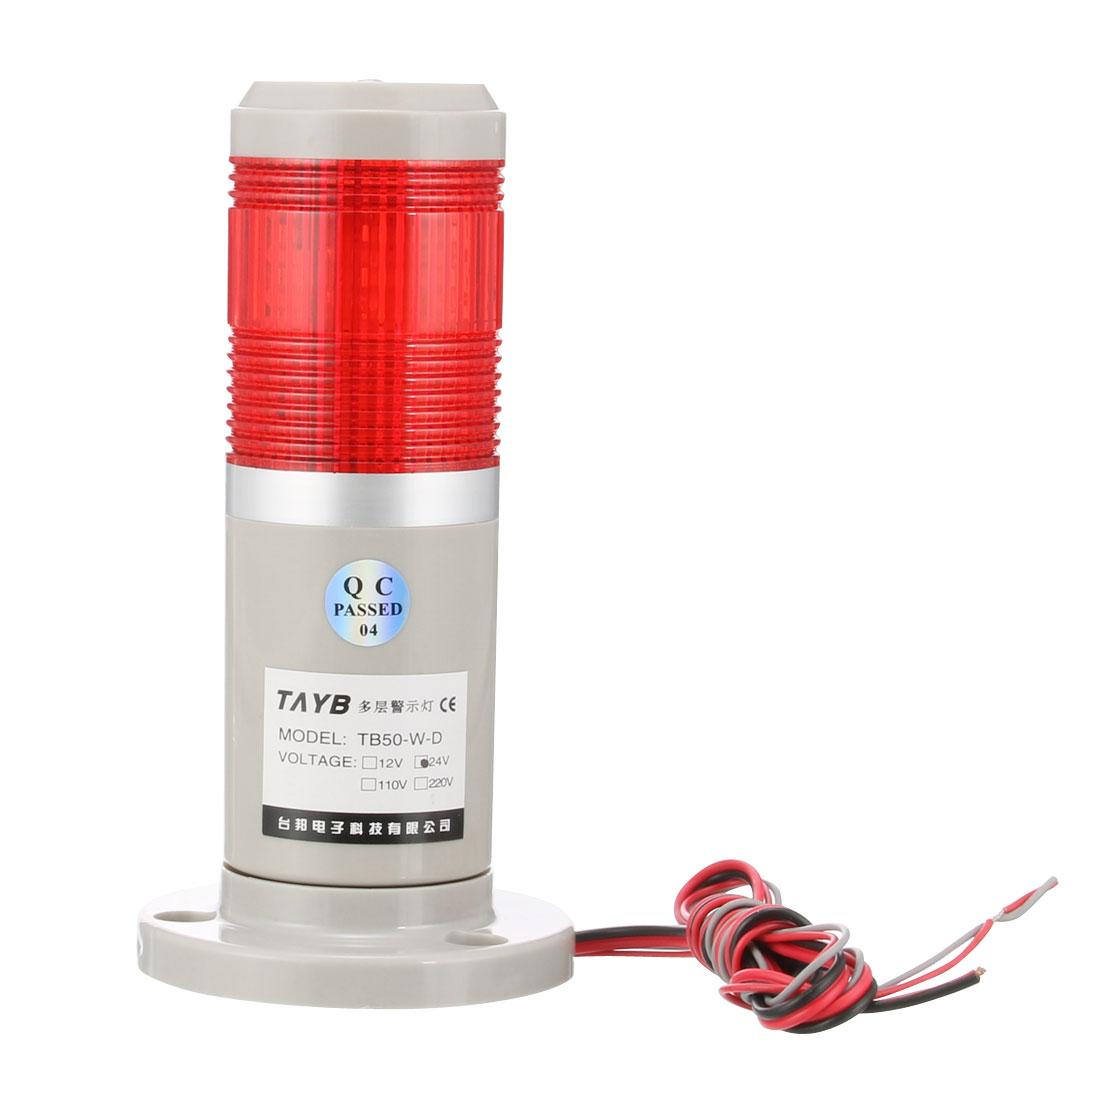 LED Warning Light Bulb Flashing Bright Signal Alarm Tower Lamp DC24V Red